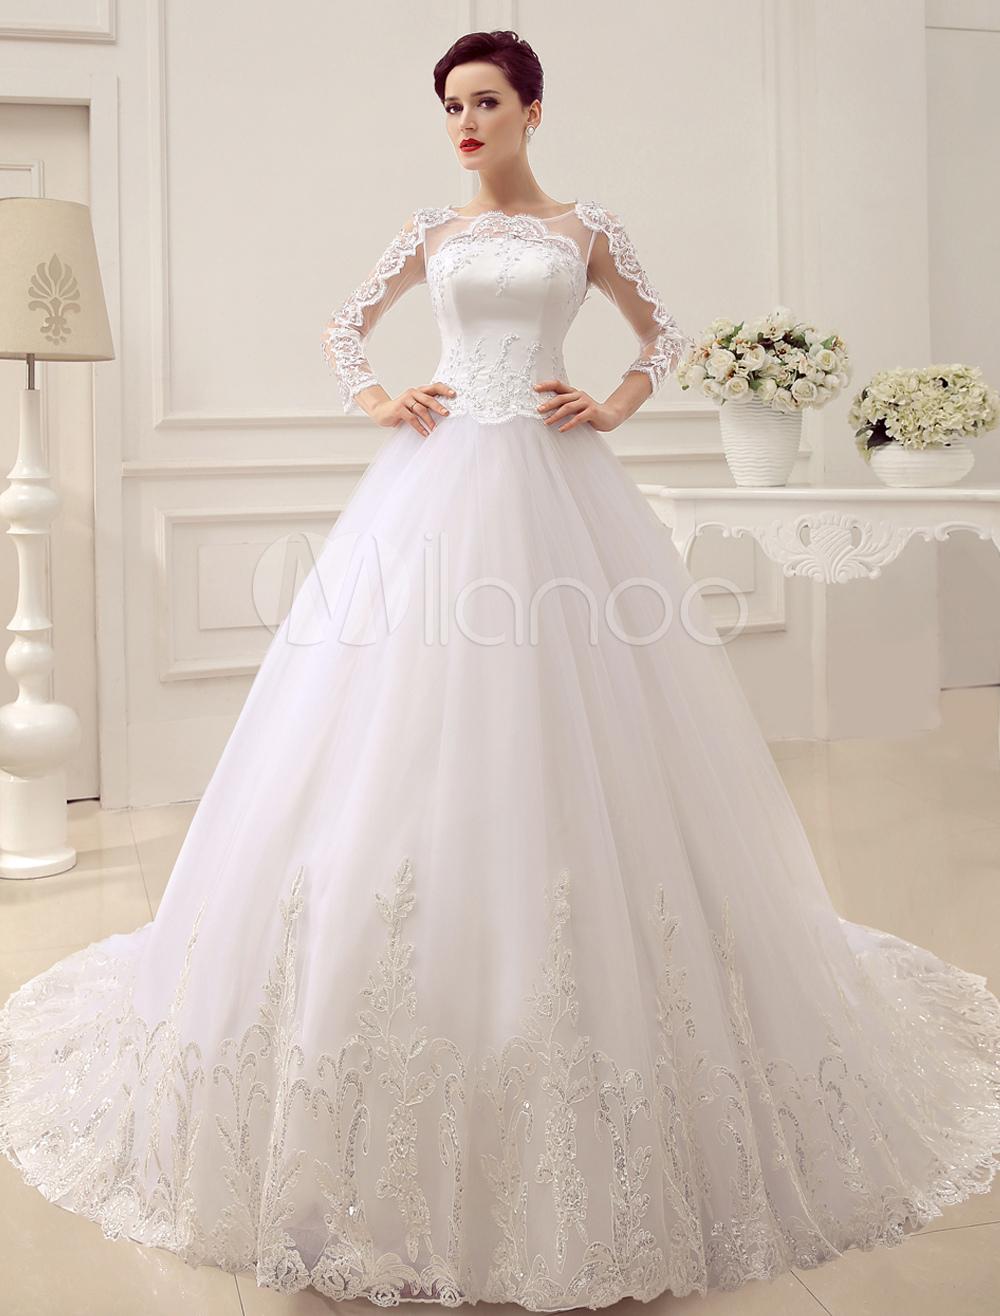 Aroos 8 مدل لباس عروس 2018؛ شیک ترین مدل لباس نامزدی مجلسی 97 مدل لباس